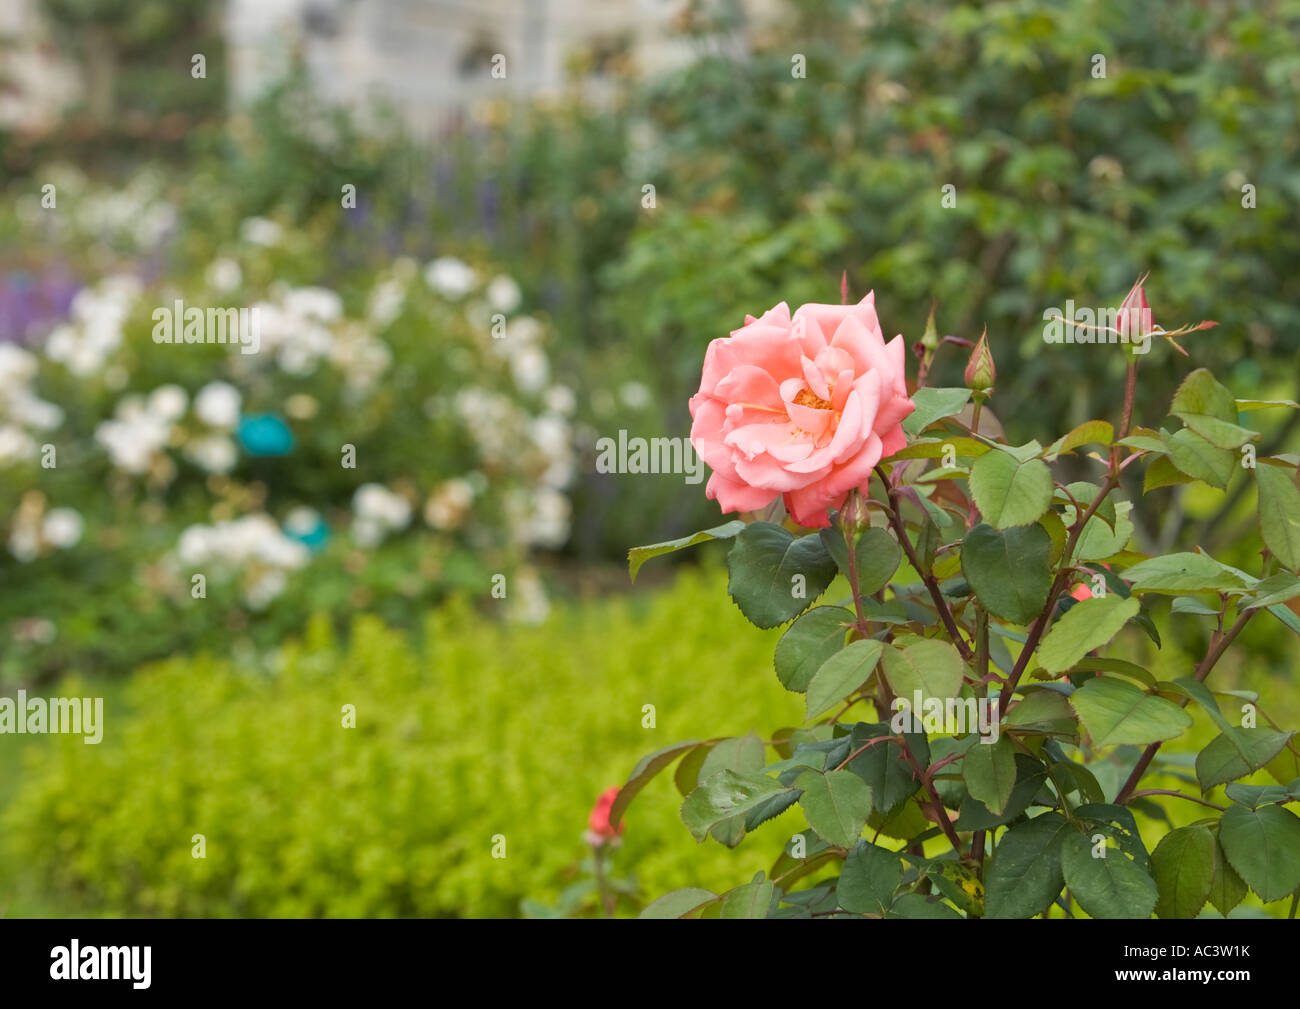 Pink rose with blurred background at L'Abbaye et les Jardins de Valloiresin france eu Stock Photo